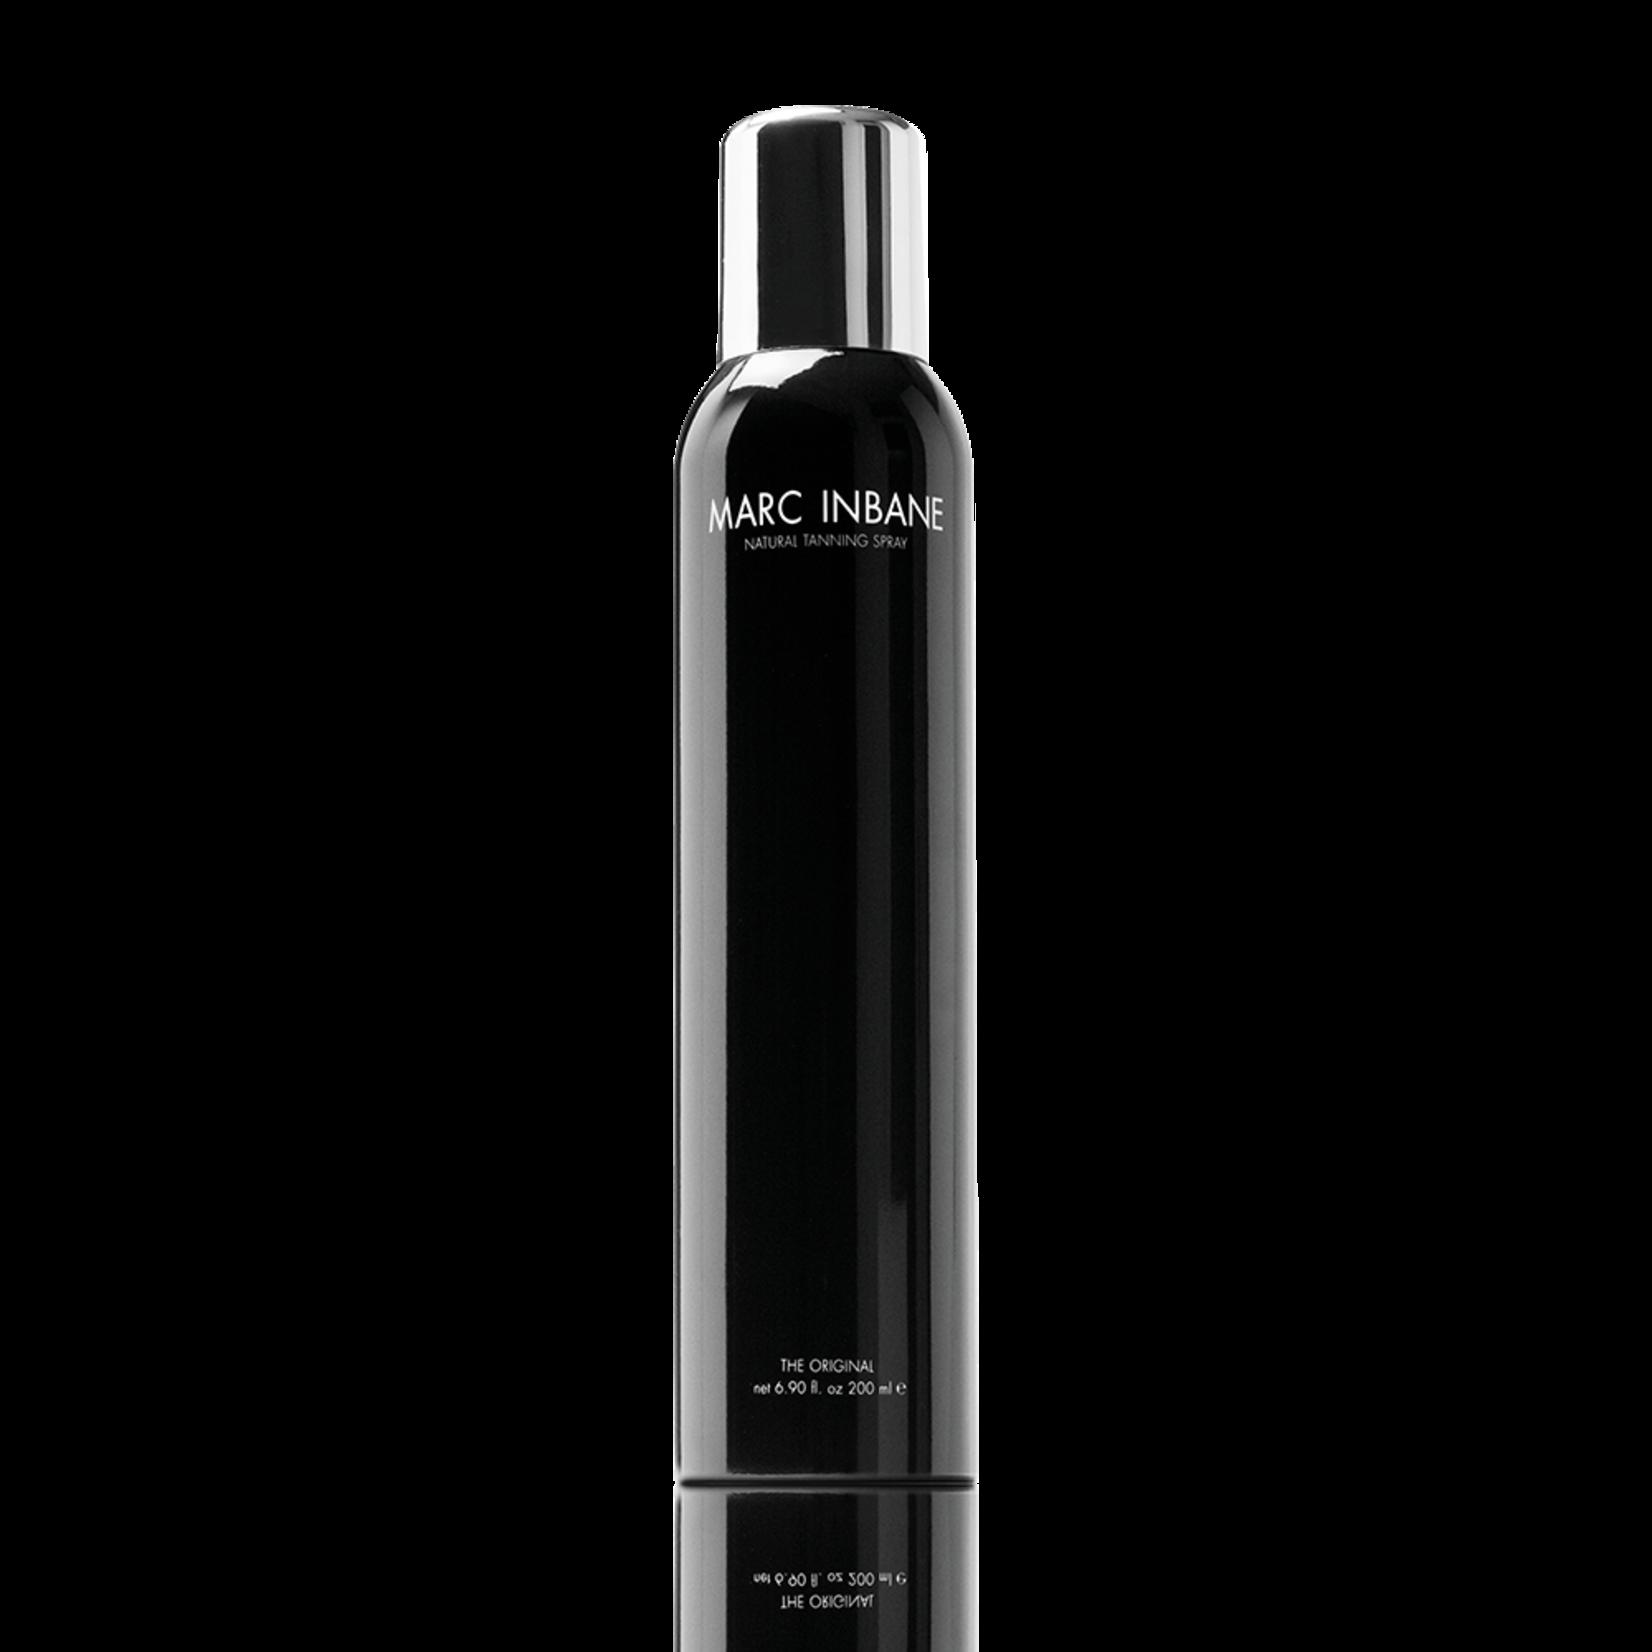 MARC INBANE MARC INBANE natural tanning spray 200ml